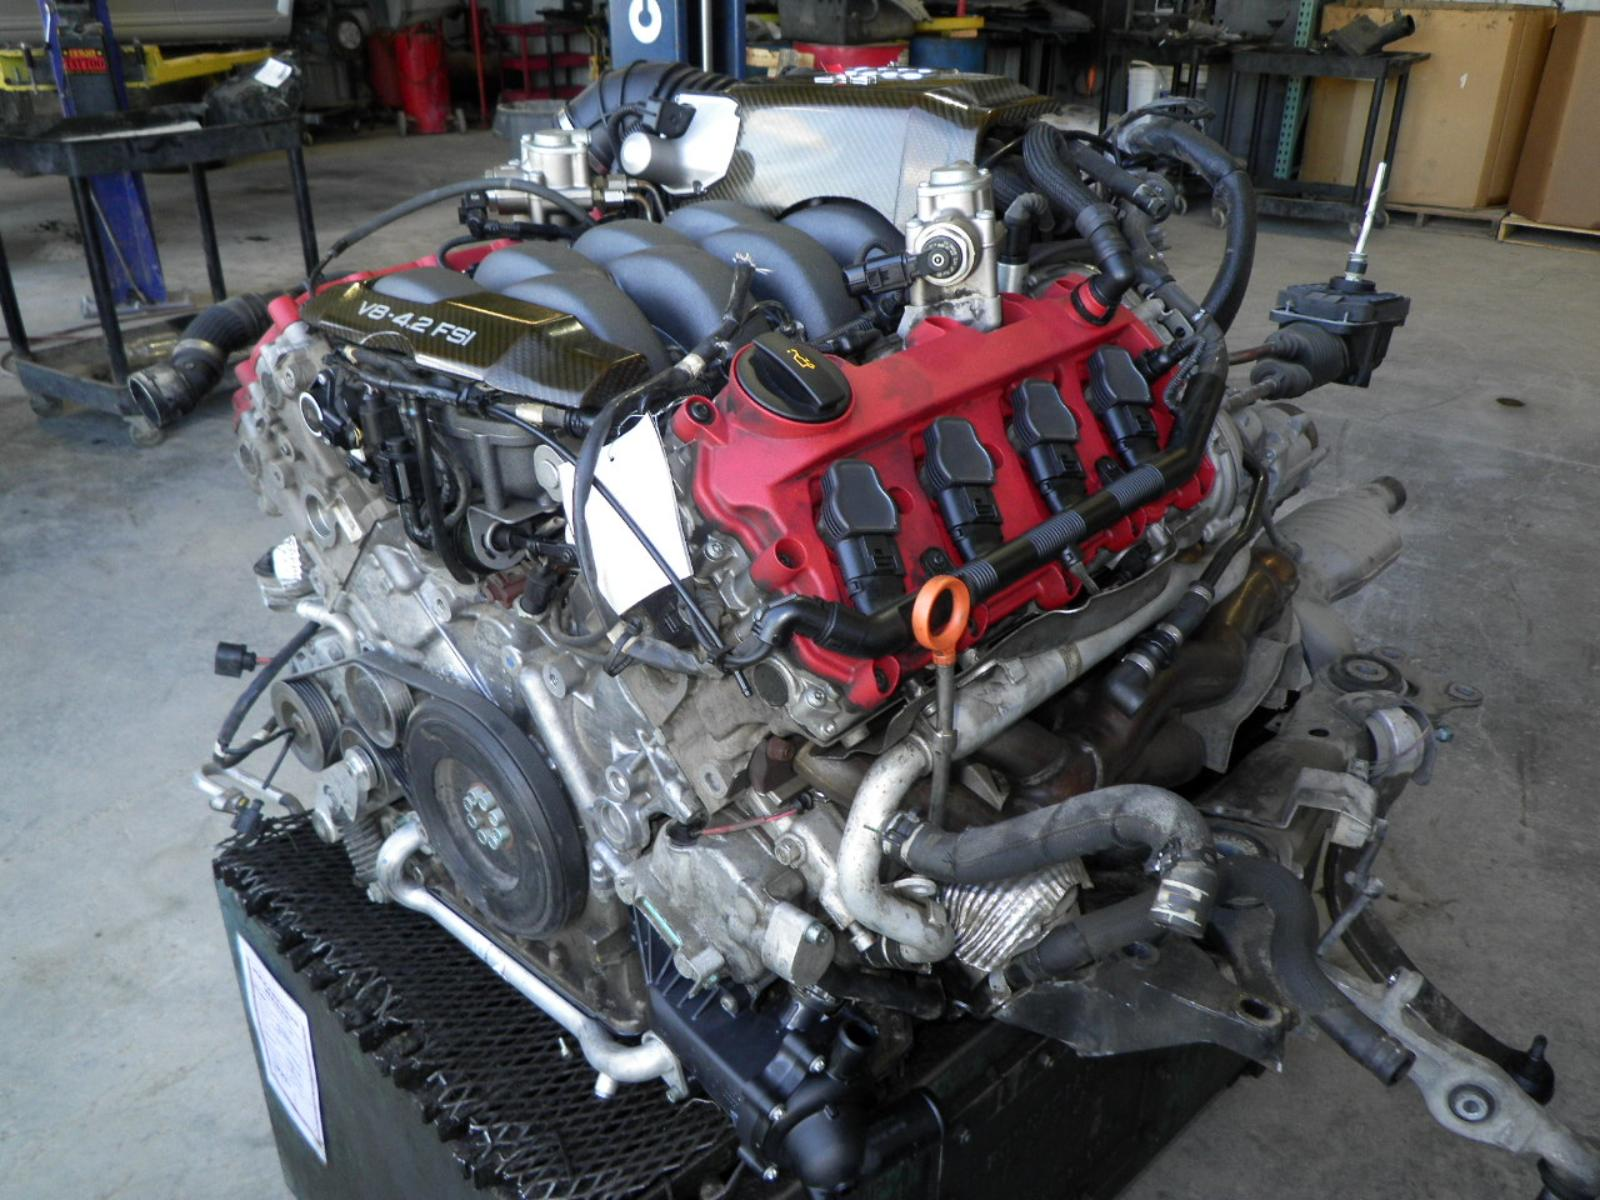 2007 AUDI RS4 ENGINE 4.2L (LONGBLOCK - NO ACCESSORIES) | eBay